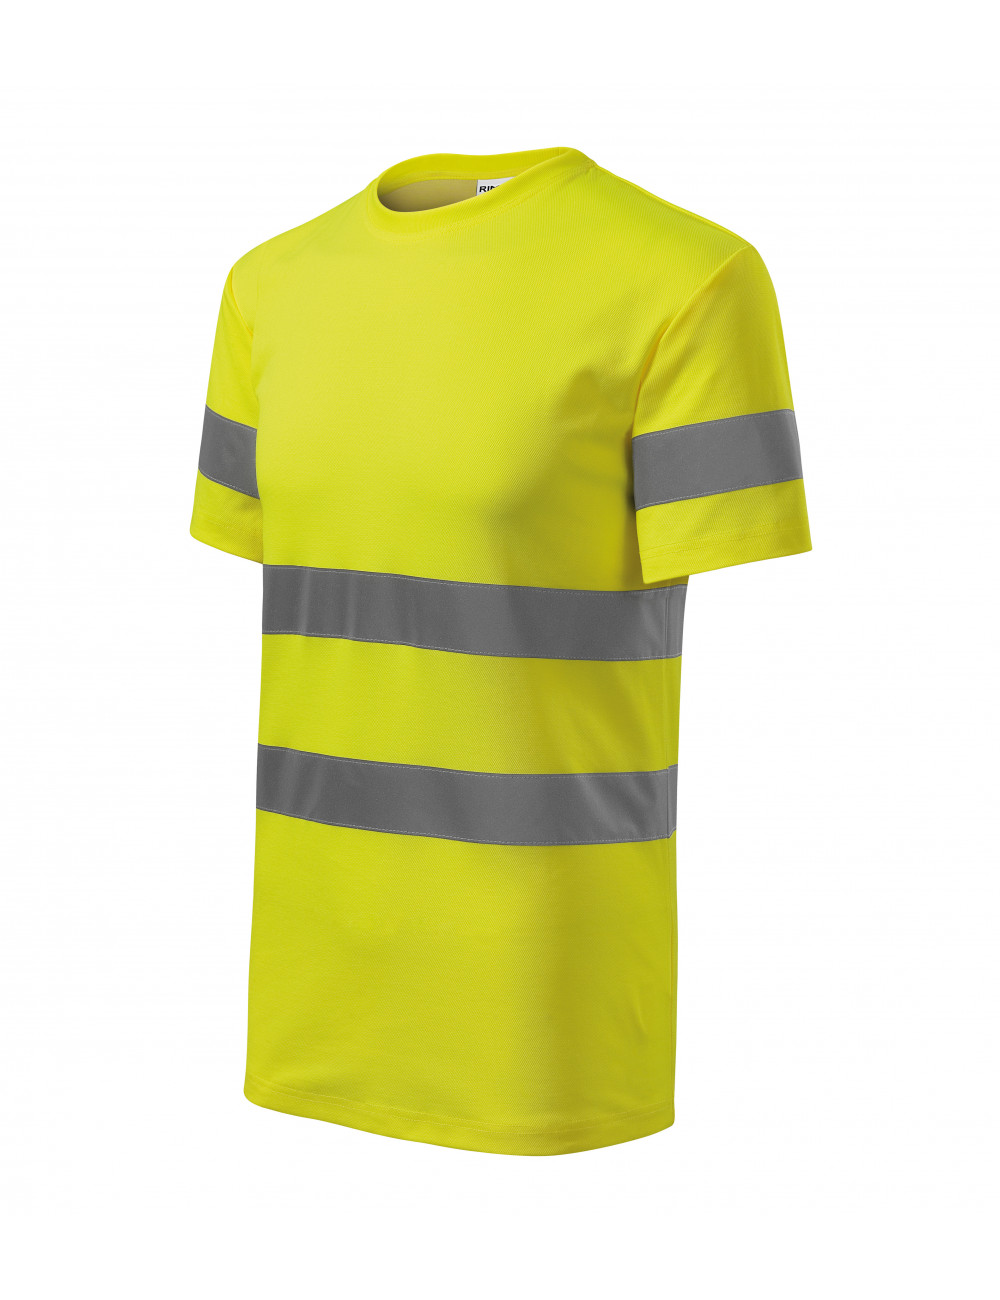 Adler RIMECK Koszulka unisex HV Protect 1V9 żółty odblaskowy